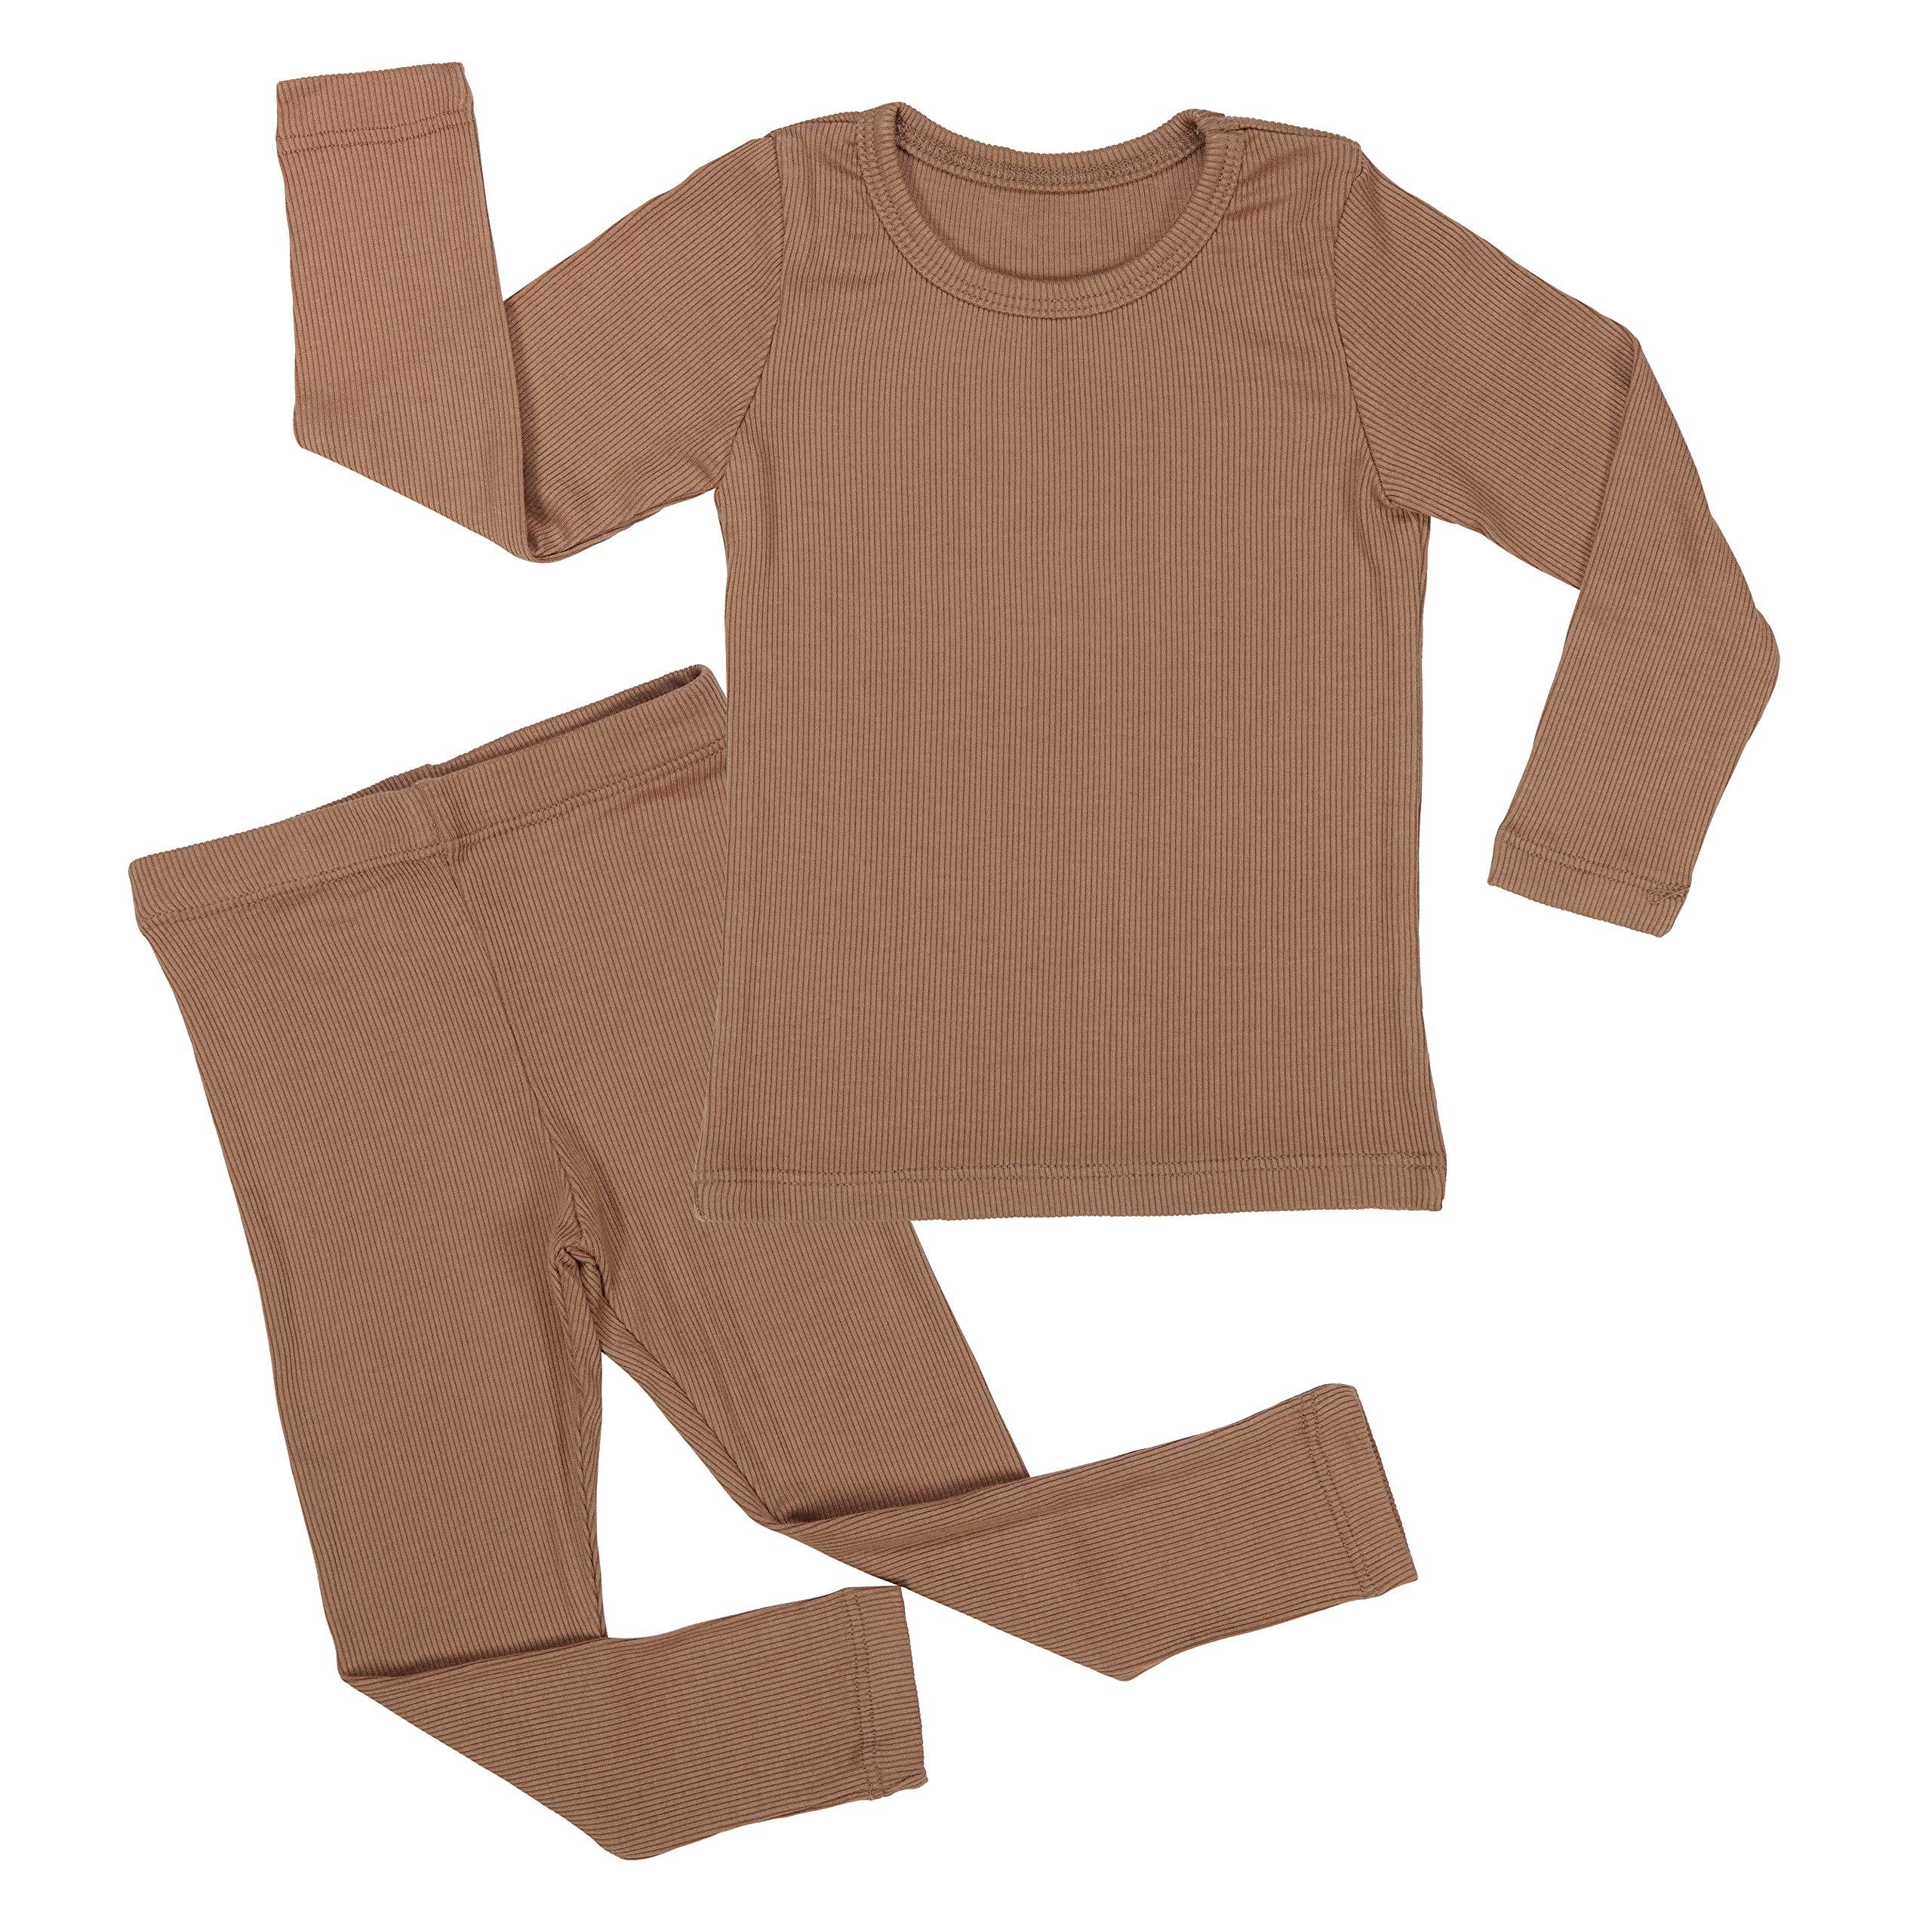 AVAUMA Baby Boy Girl Long Sleeve Ribbed Pajamas Set Snug-Fit Fall Winter Pjs Sleepwear Kids Toddler (JL / 7T - 8T, Camel(L))